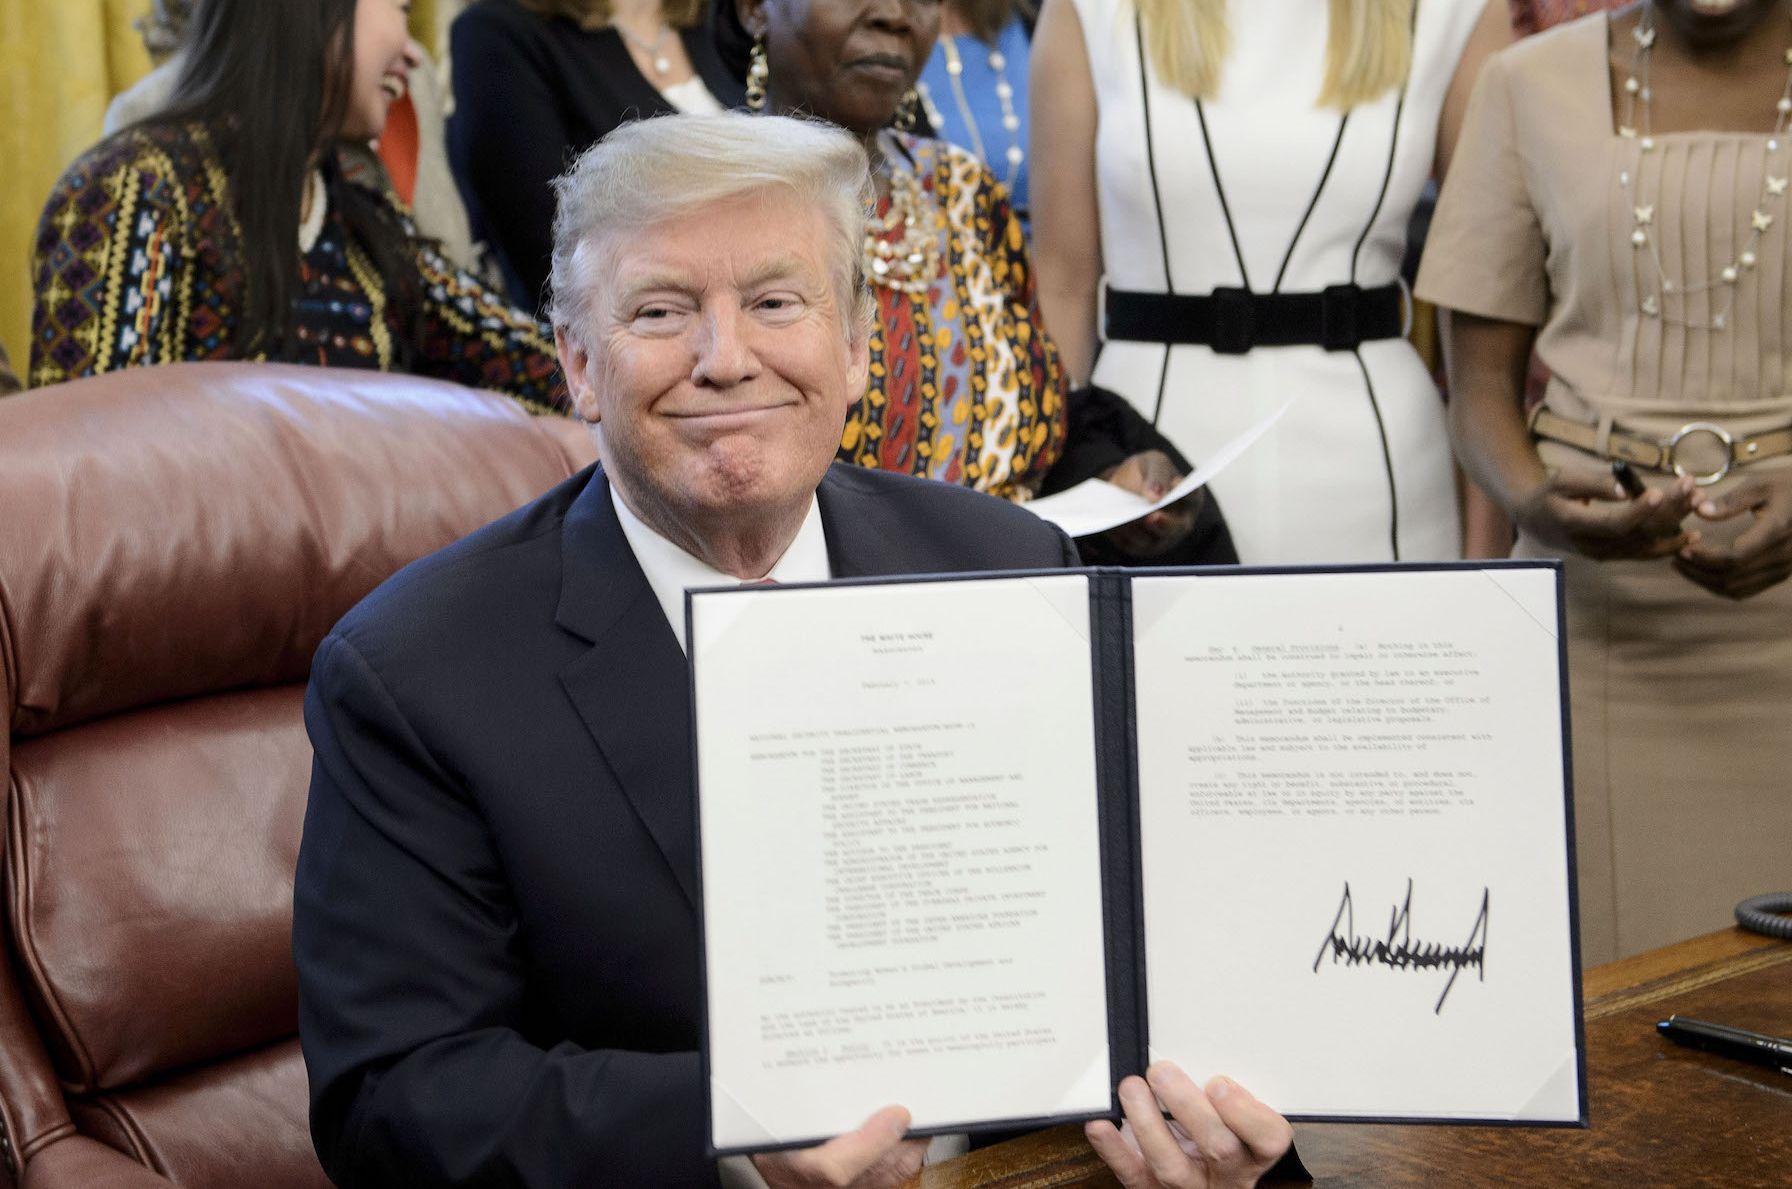 The Hunt for Donald Trump's Tax Returns Has Begun